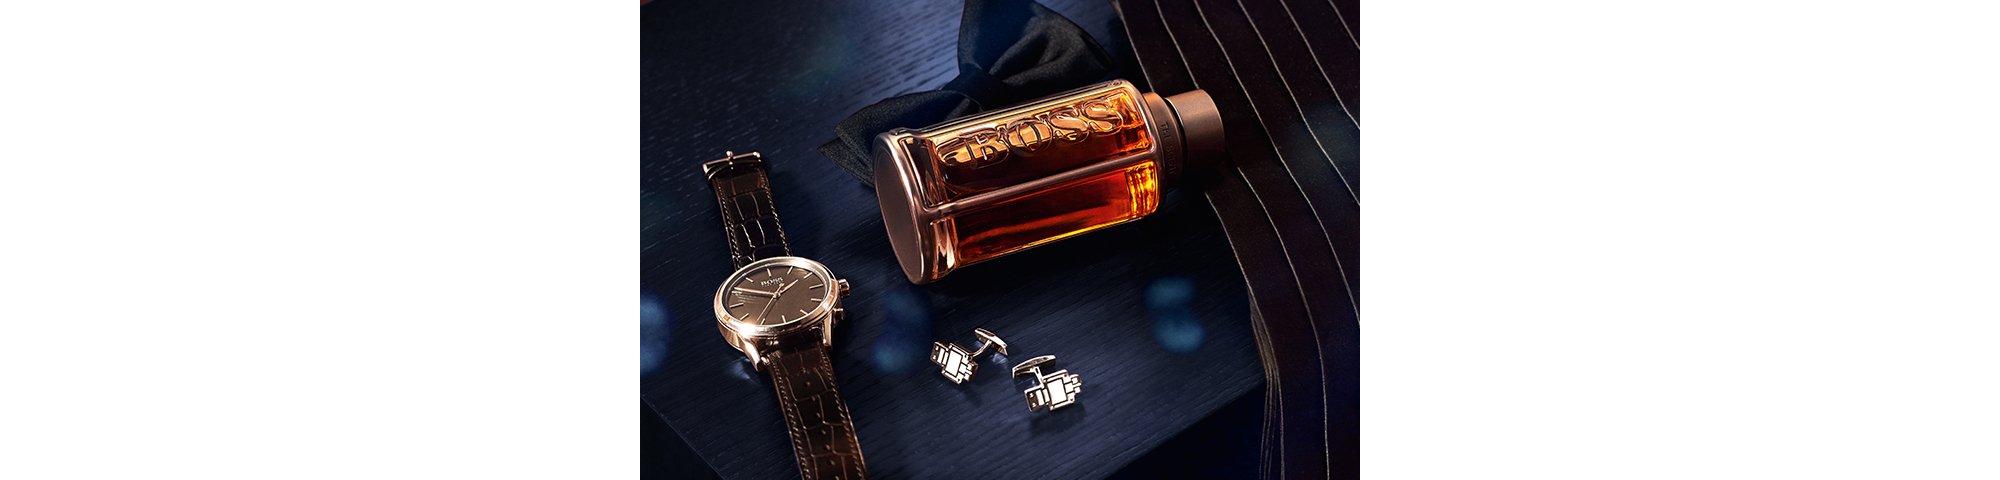 Zwart vlinderdasje, zwart horloge, geur BOSS Bottled en BOSSbot-manchetknopen van BOSS